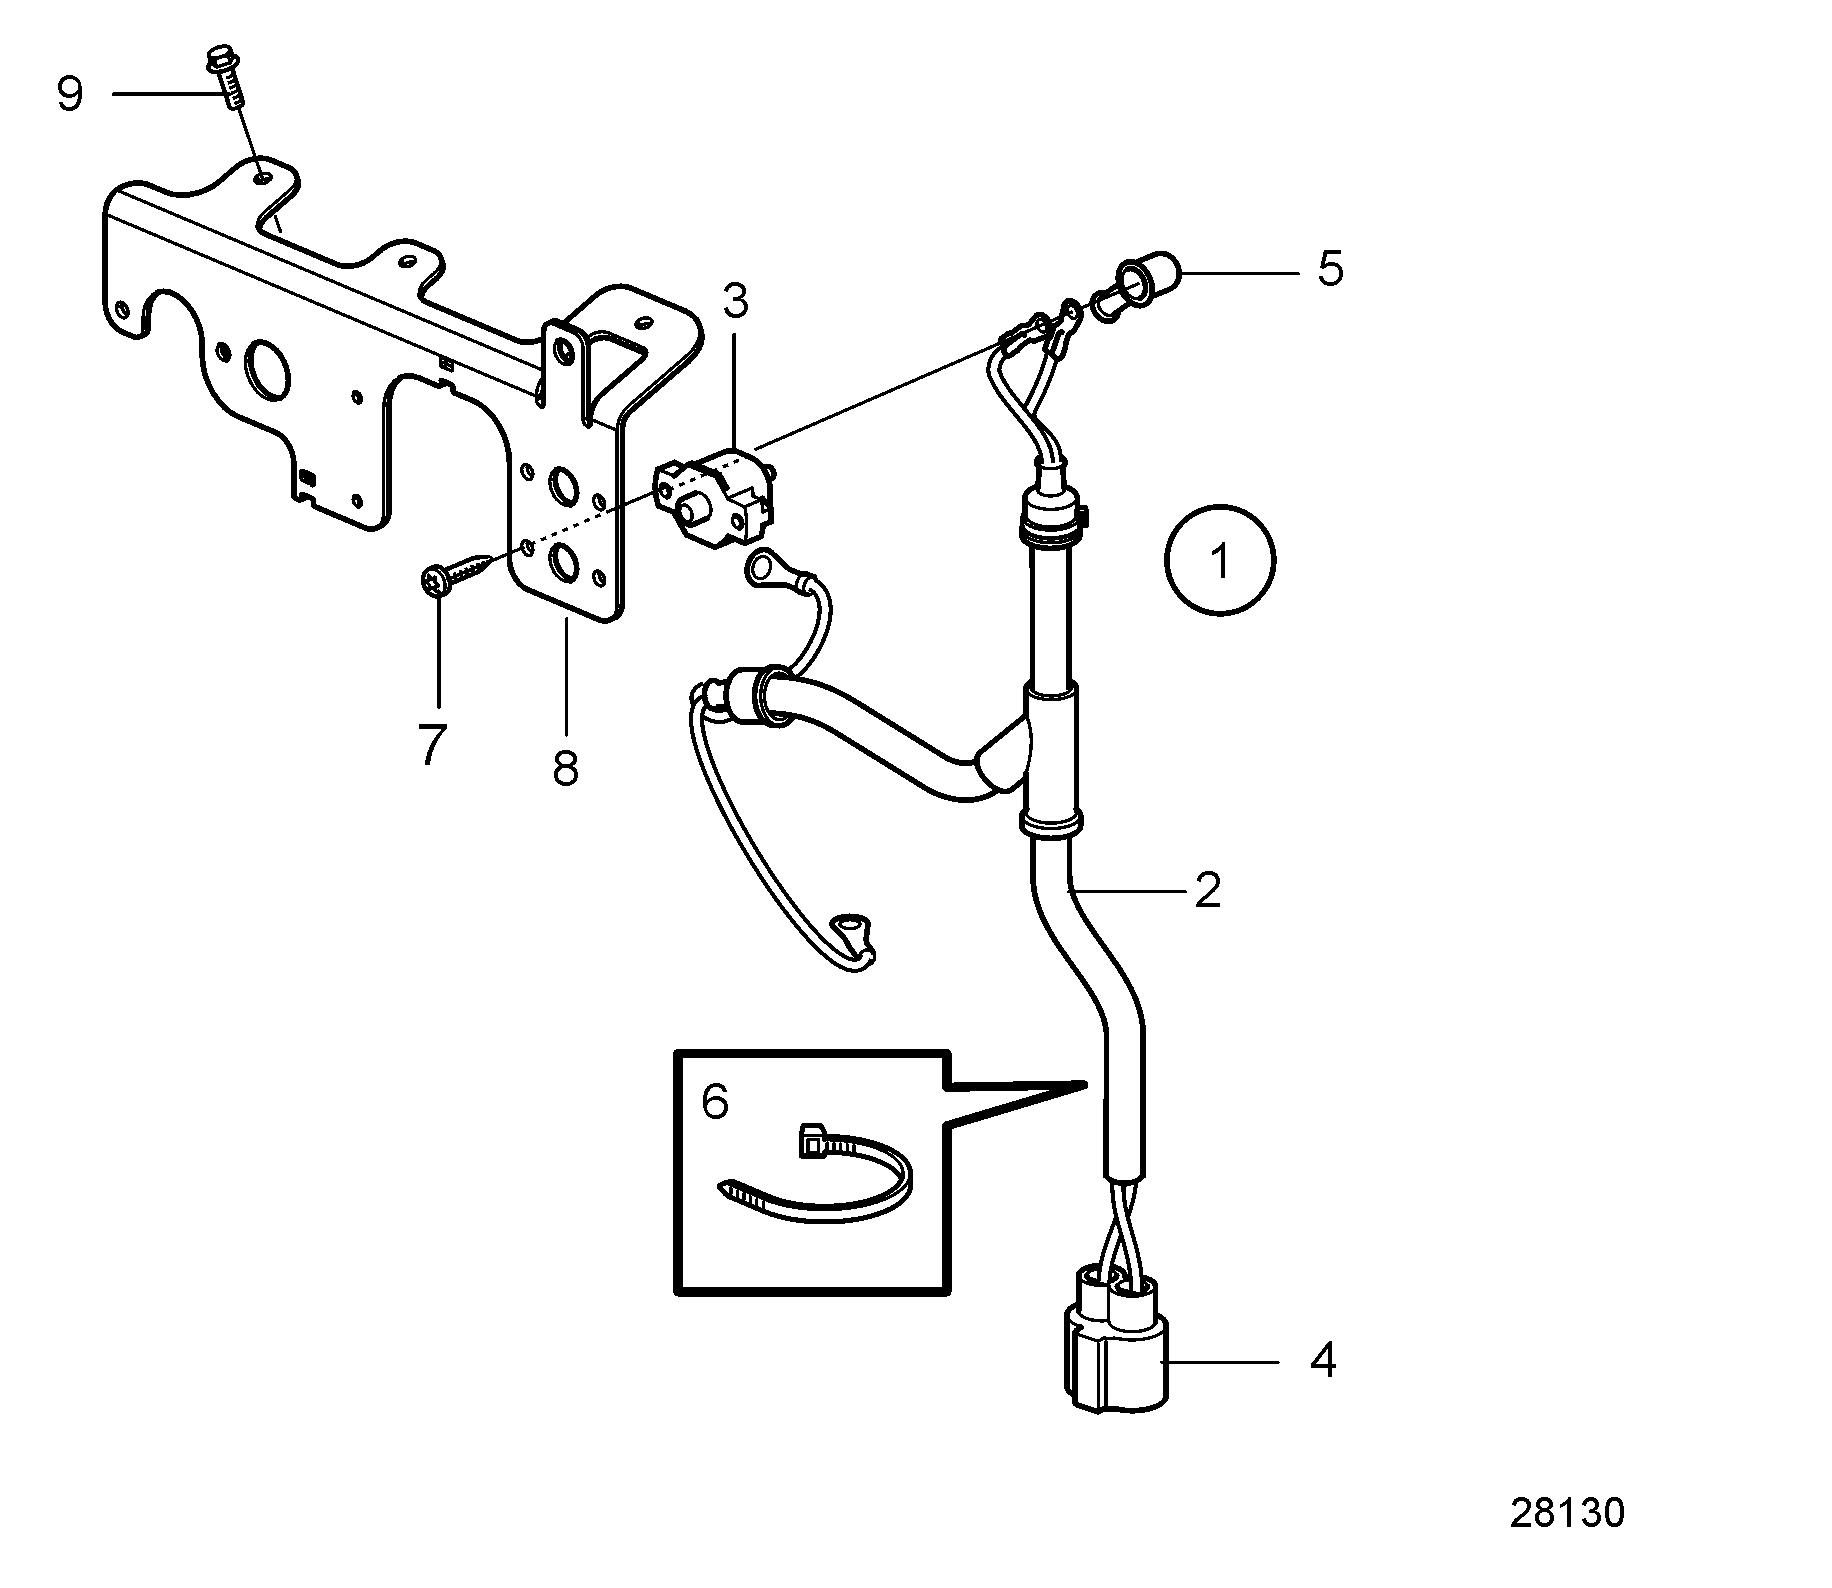 schema elettrico trim volvo penta  u2013 idee immagine auto